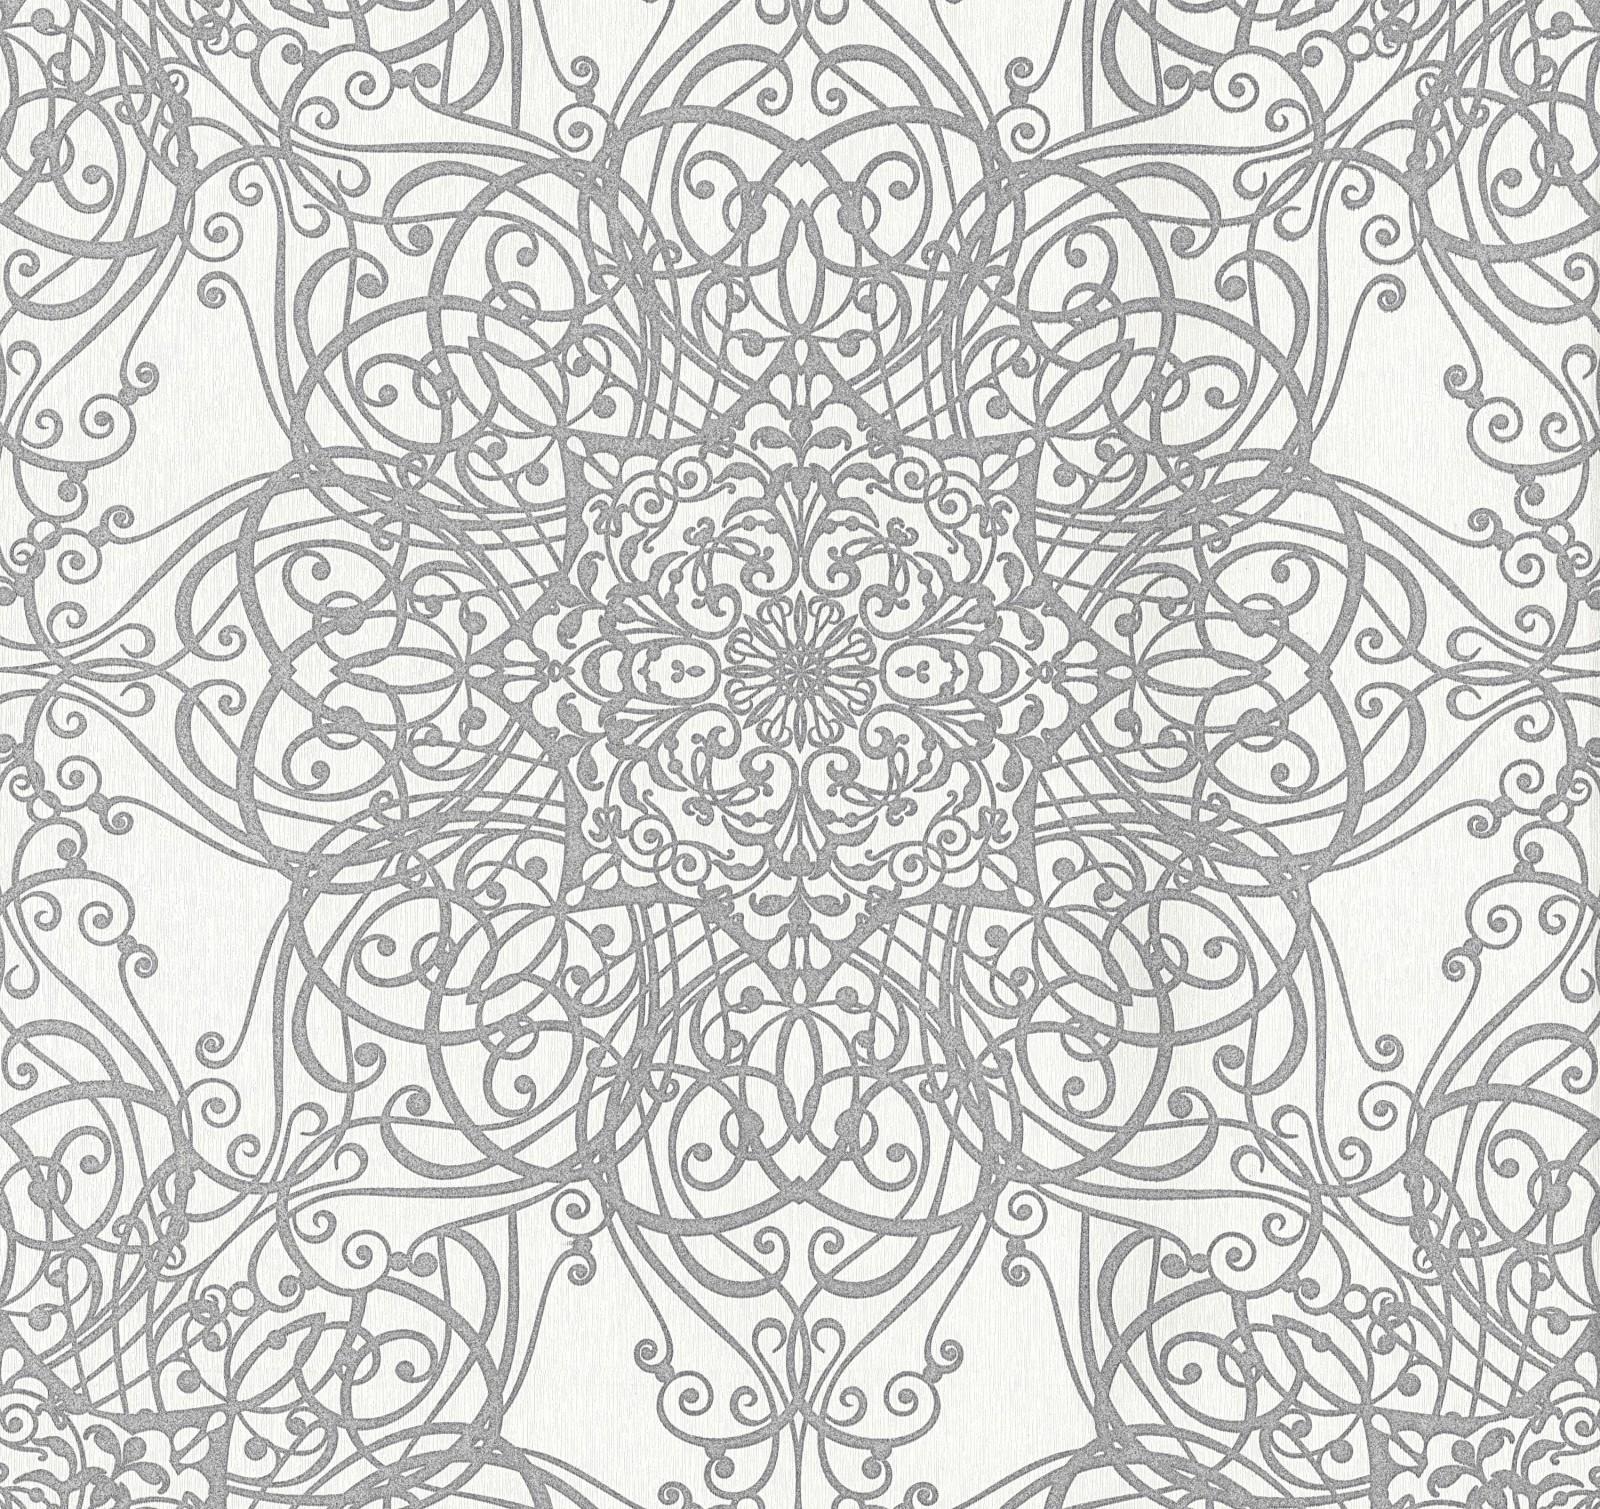 tapete guido maria kretschmer ornament creme 02465 30. Black Bedroom Furniture Sets. Home Design Ideas